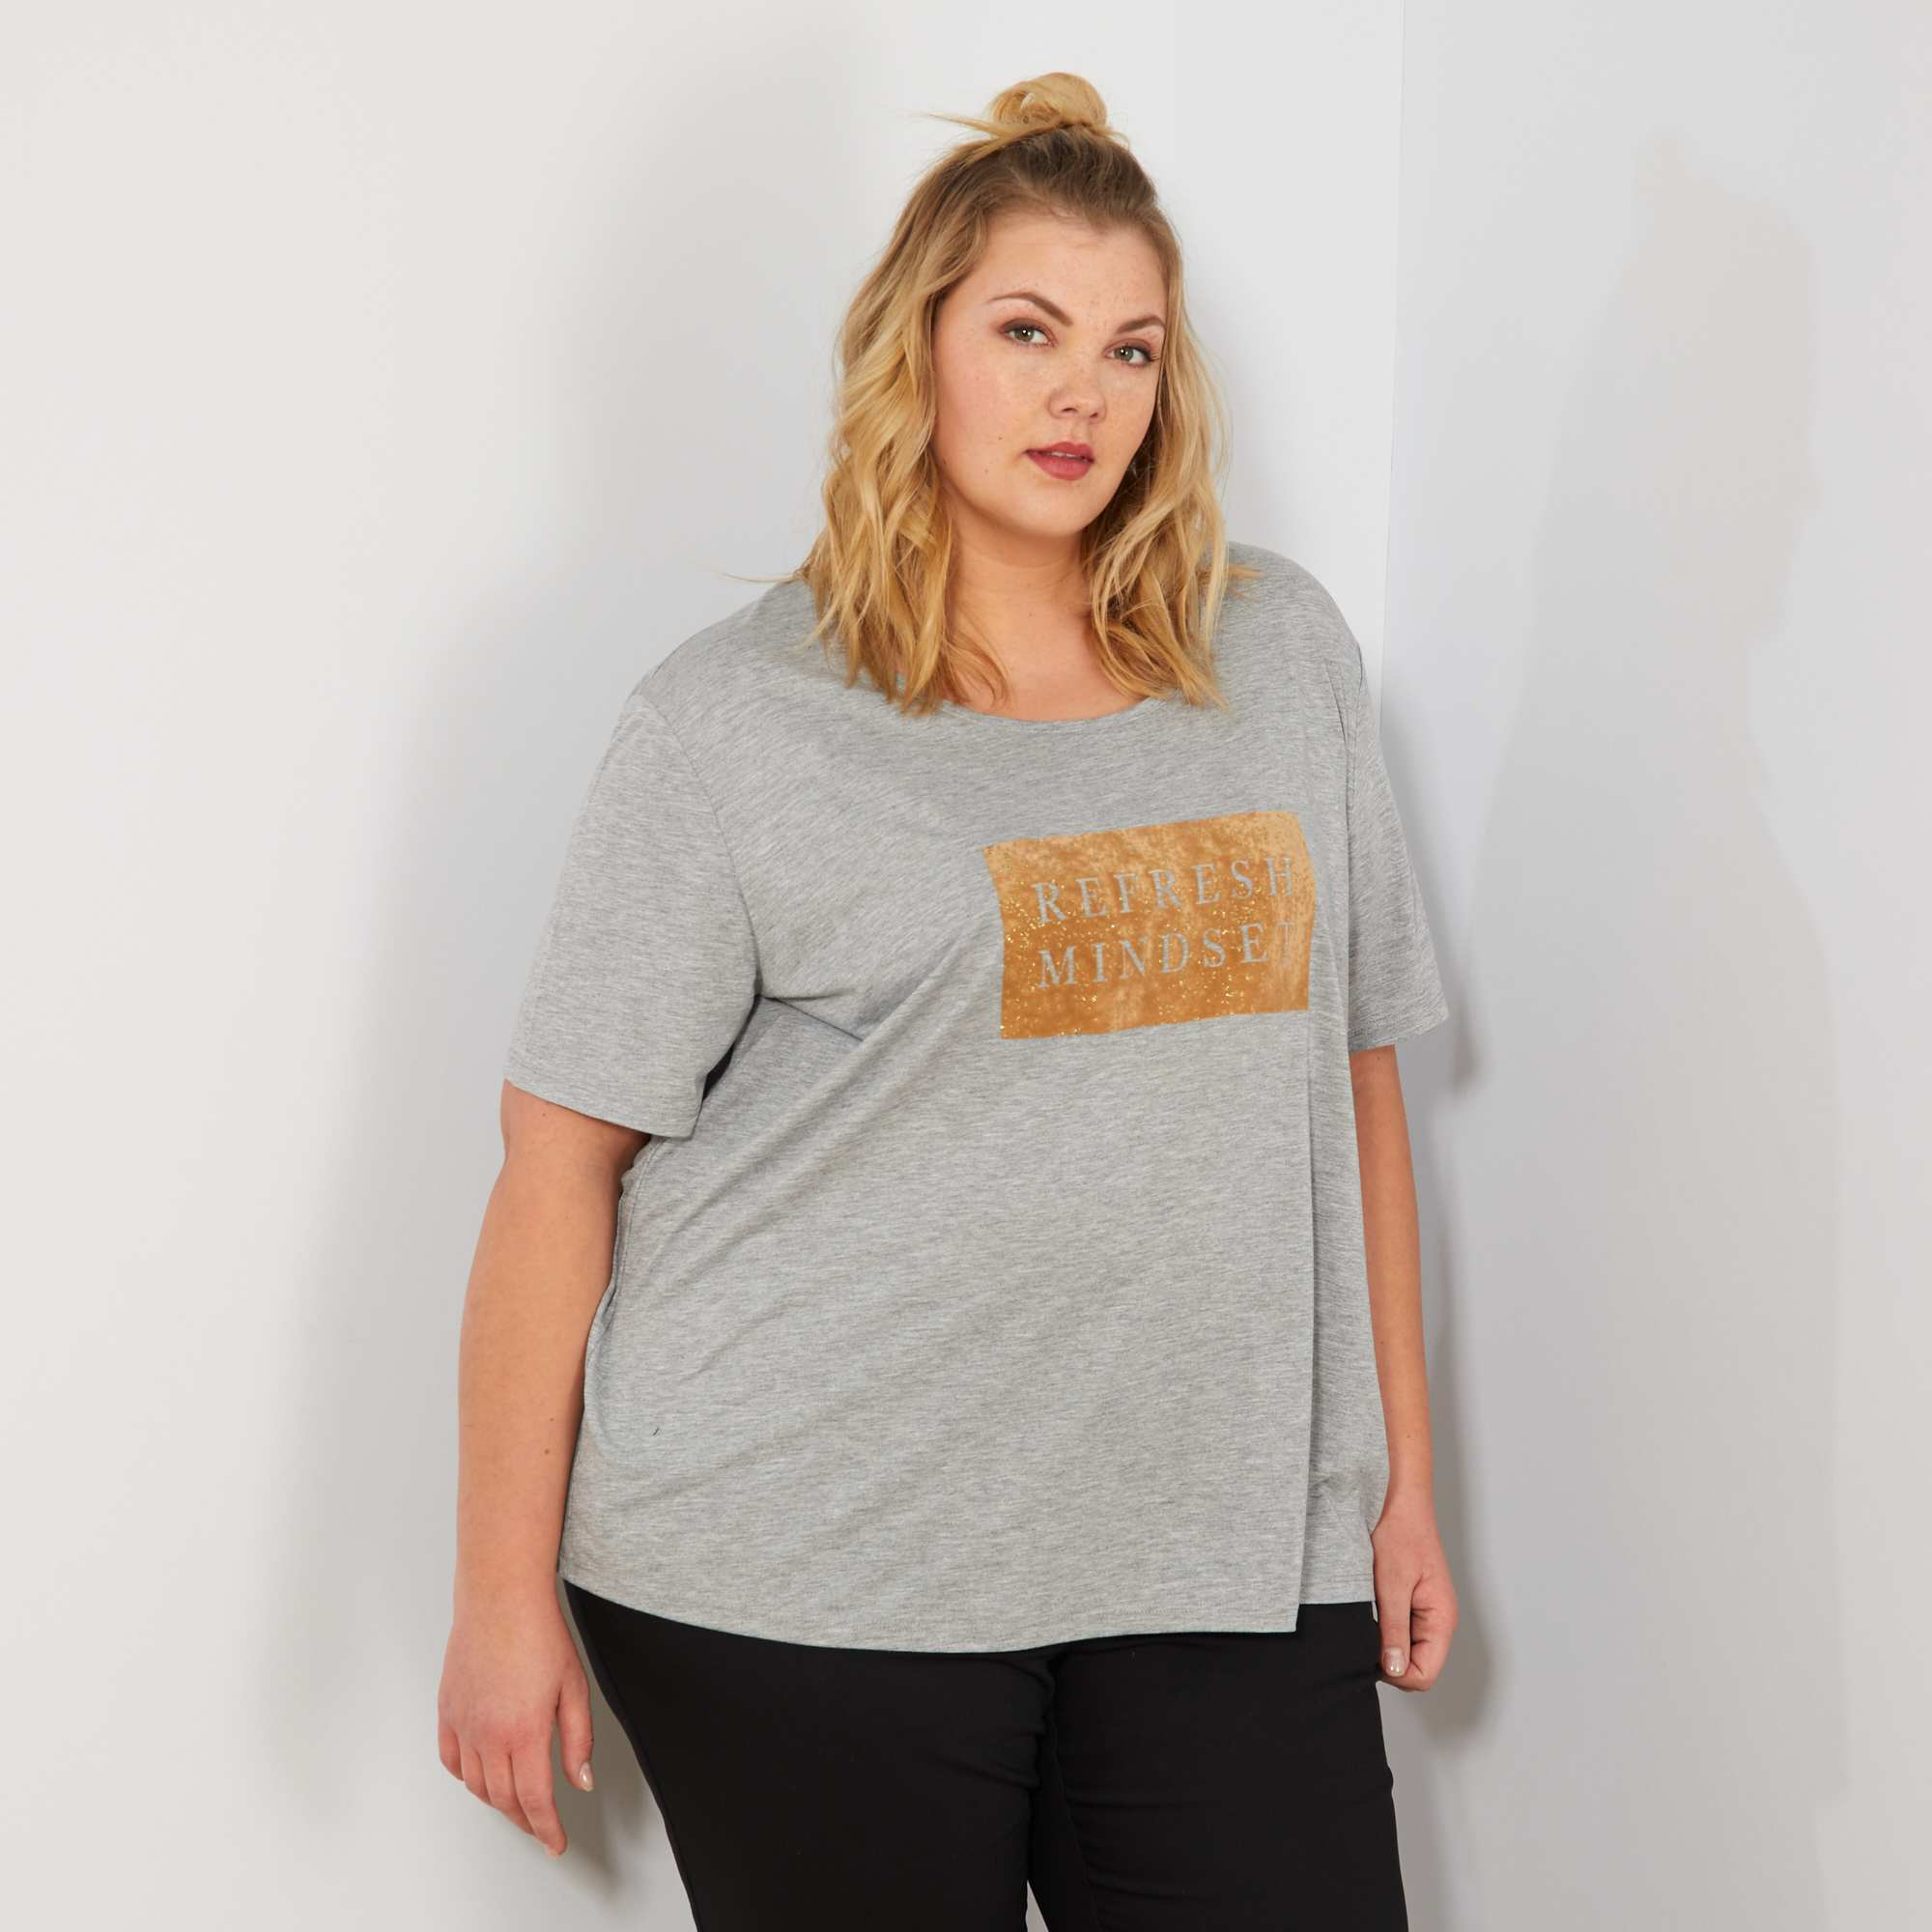 Camiseta Adorno Gris Grandes De Mujer Con Terciopelo Tallas wHpqUFxgwr